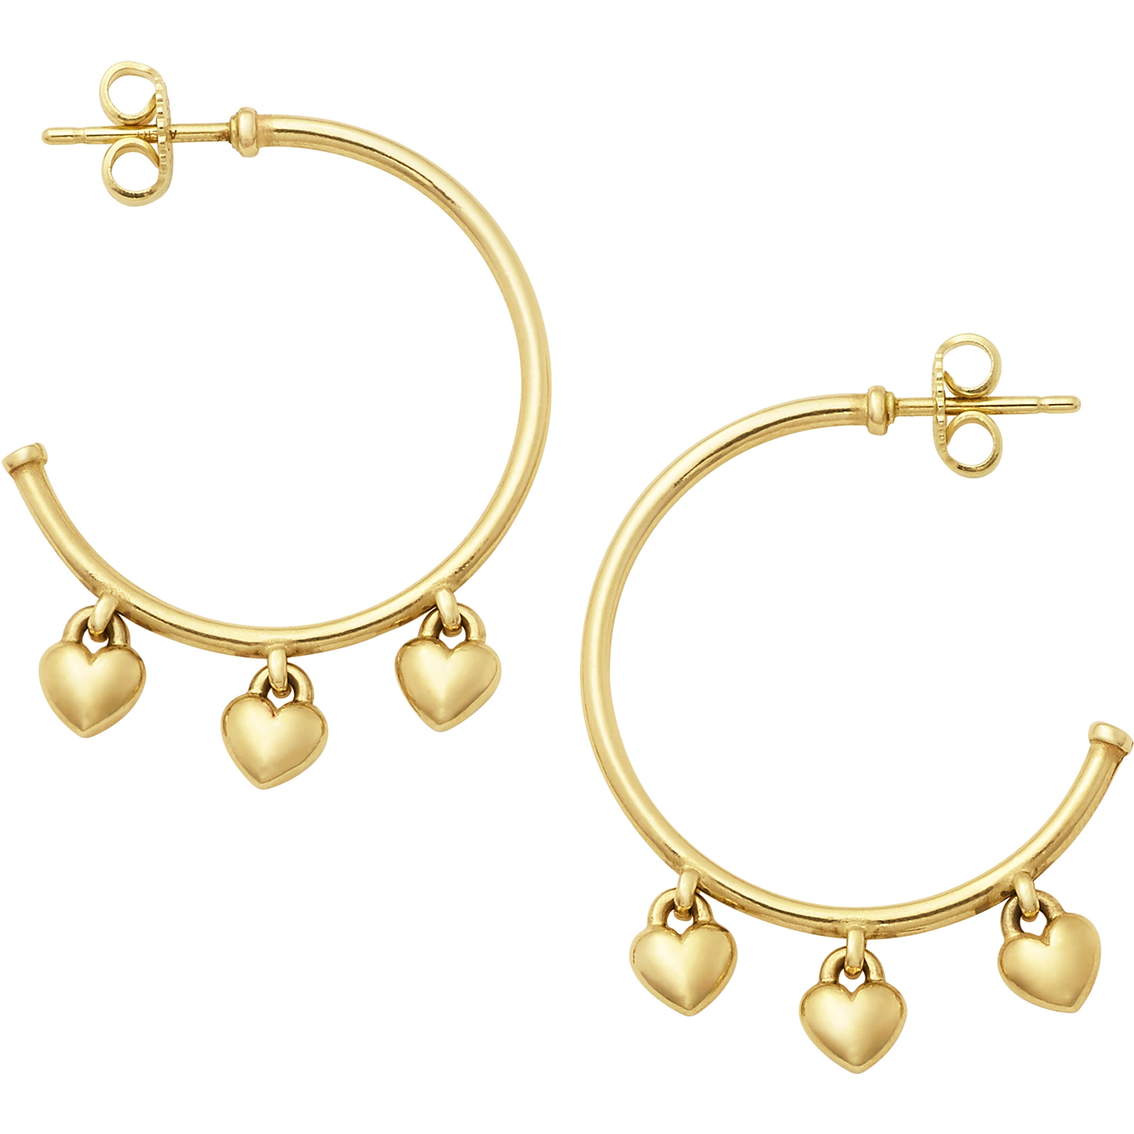 James Avery Heart Drops Hoop Ear Posts Silver Earrings Jewelry Watches Shop The Exchange